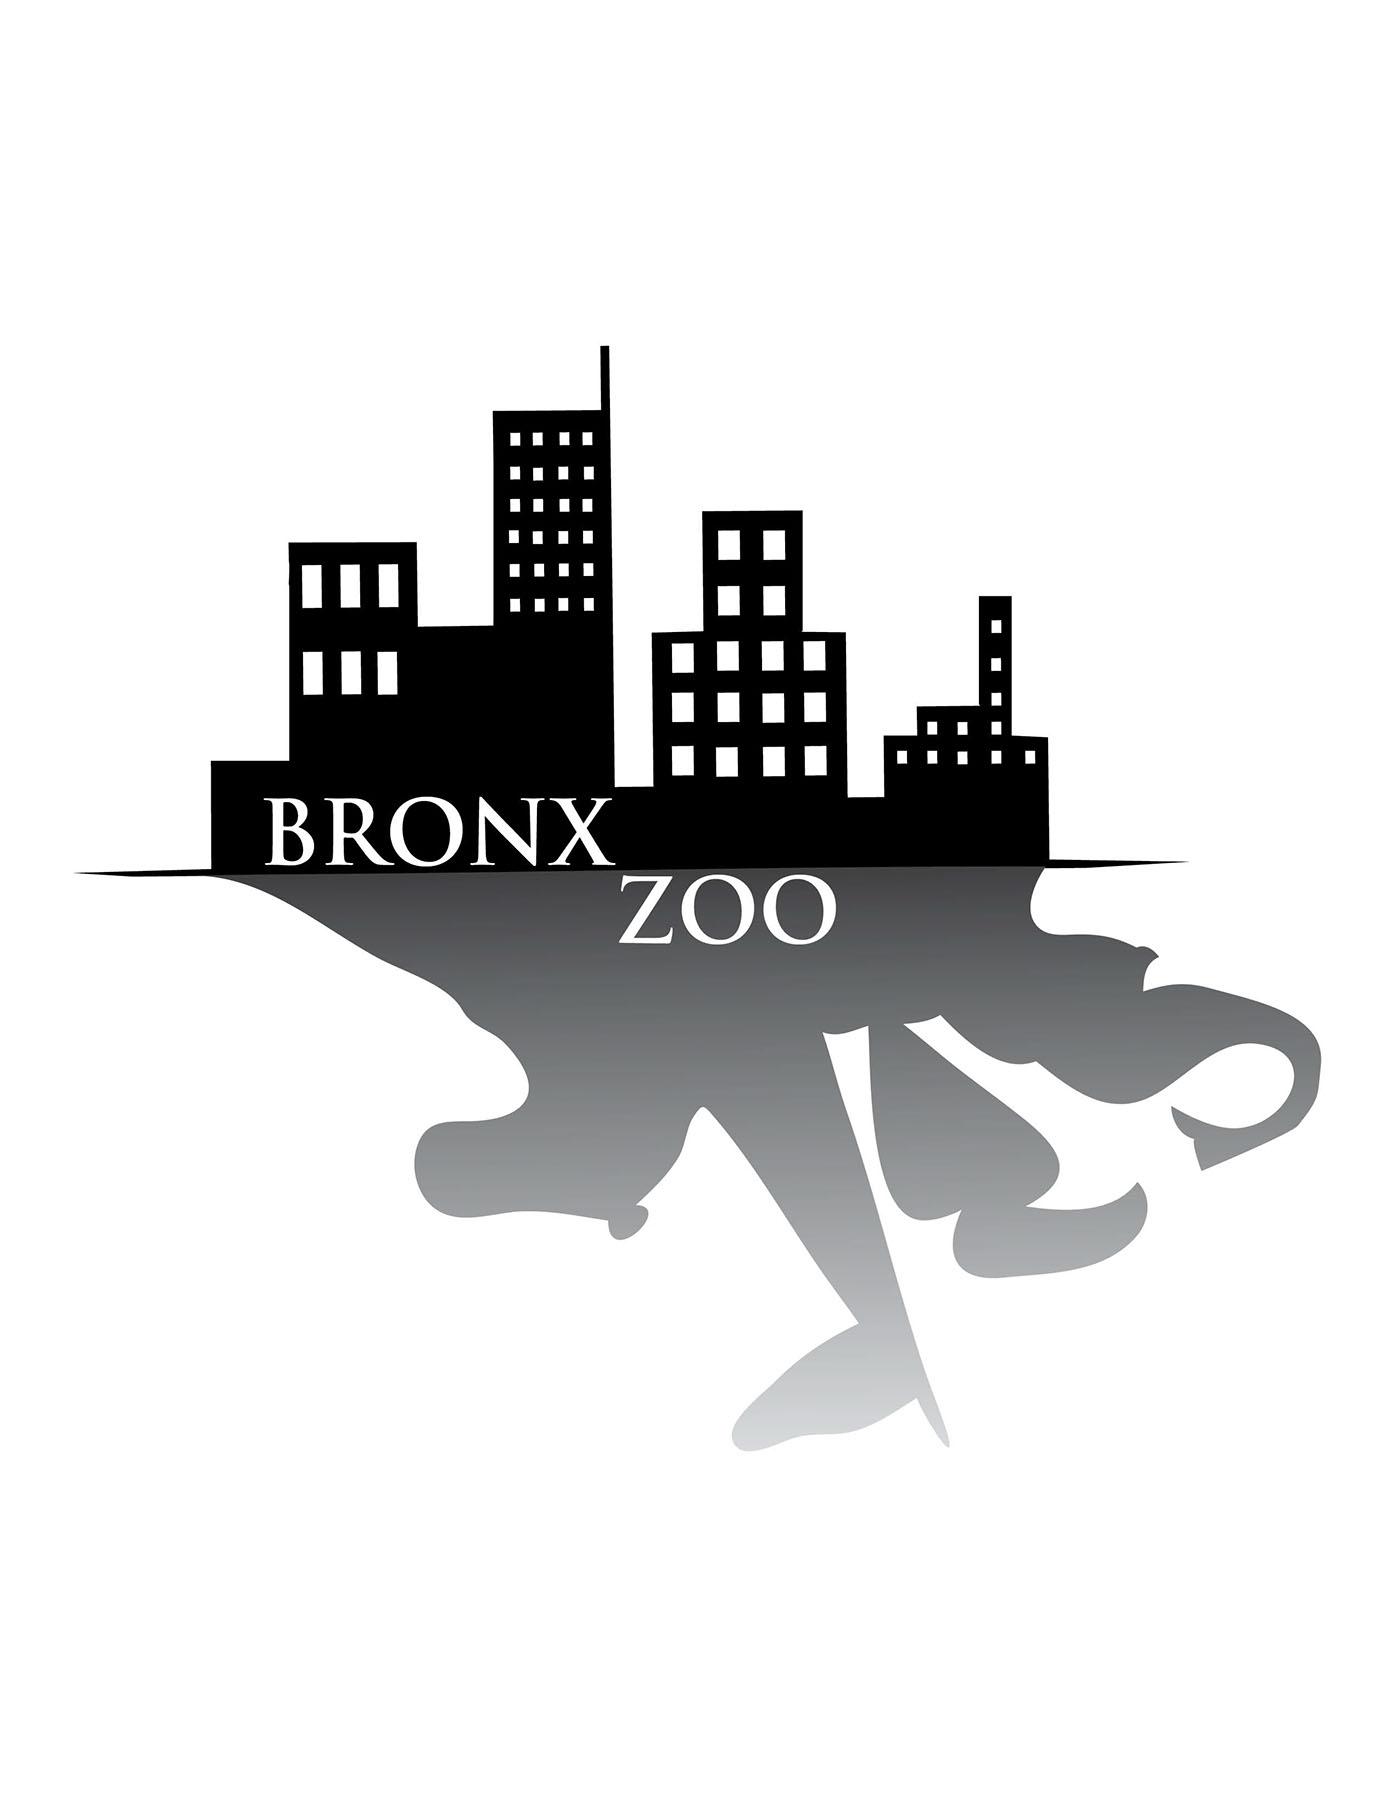 15 Ingenious Logos Making Smart Use of Symbolism  |Bronx Zoo Logo